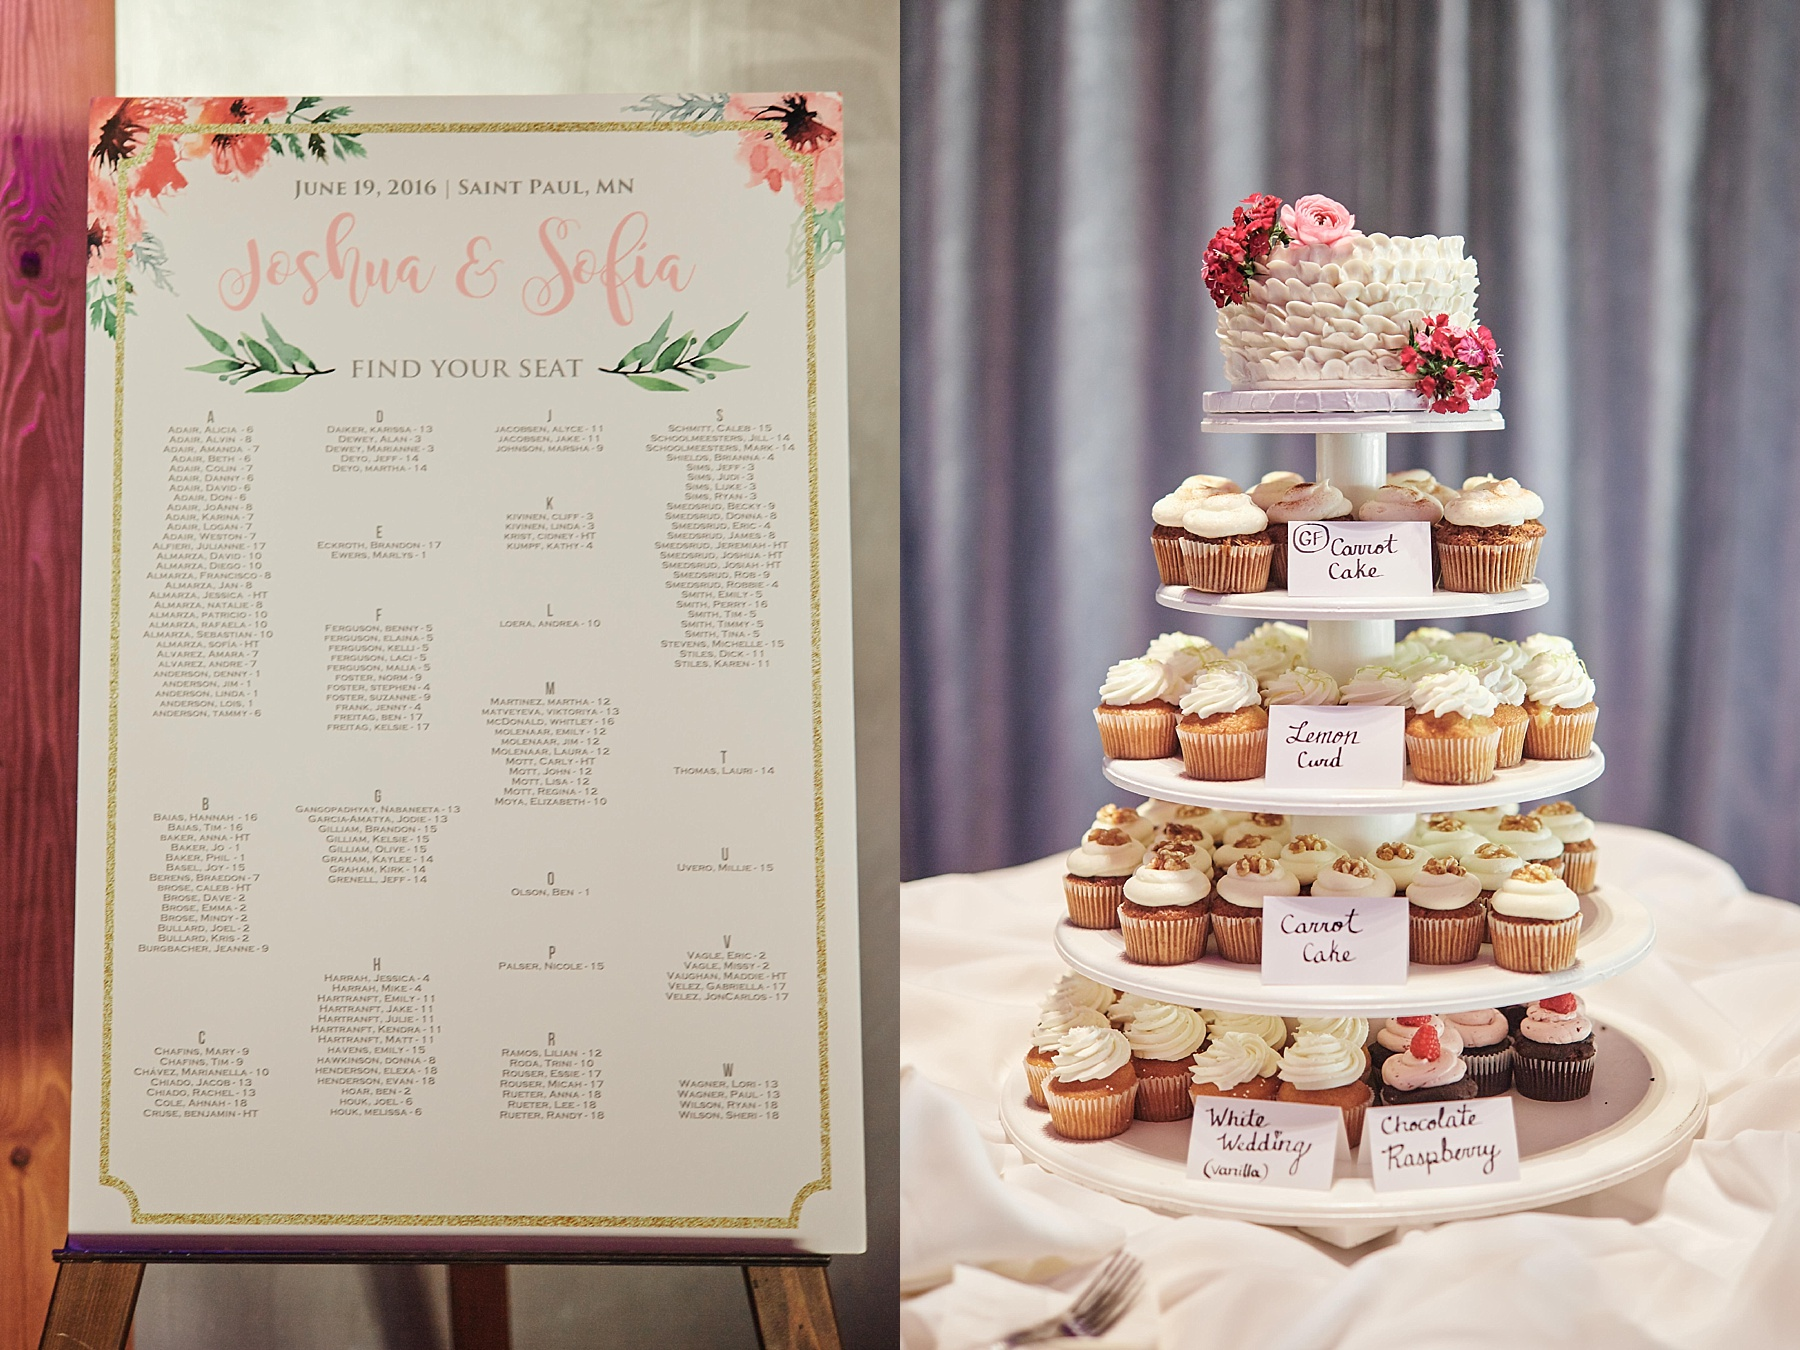 ABULAE-Wedding-Saint-paul-MN-Josh-Sofia-Wedding-Mears-Park_0805.jpg